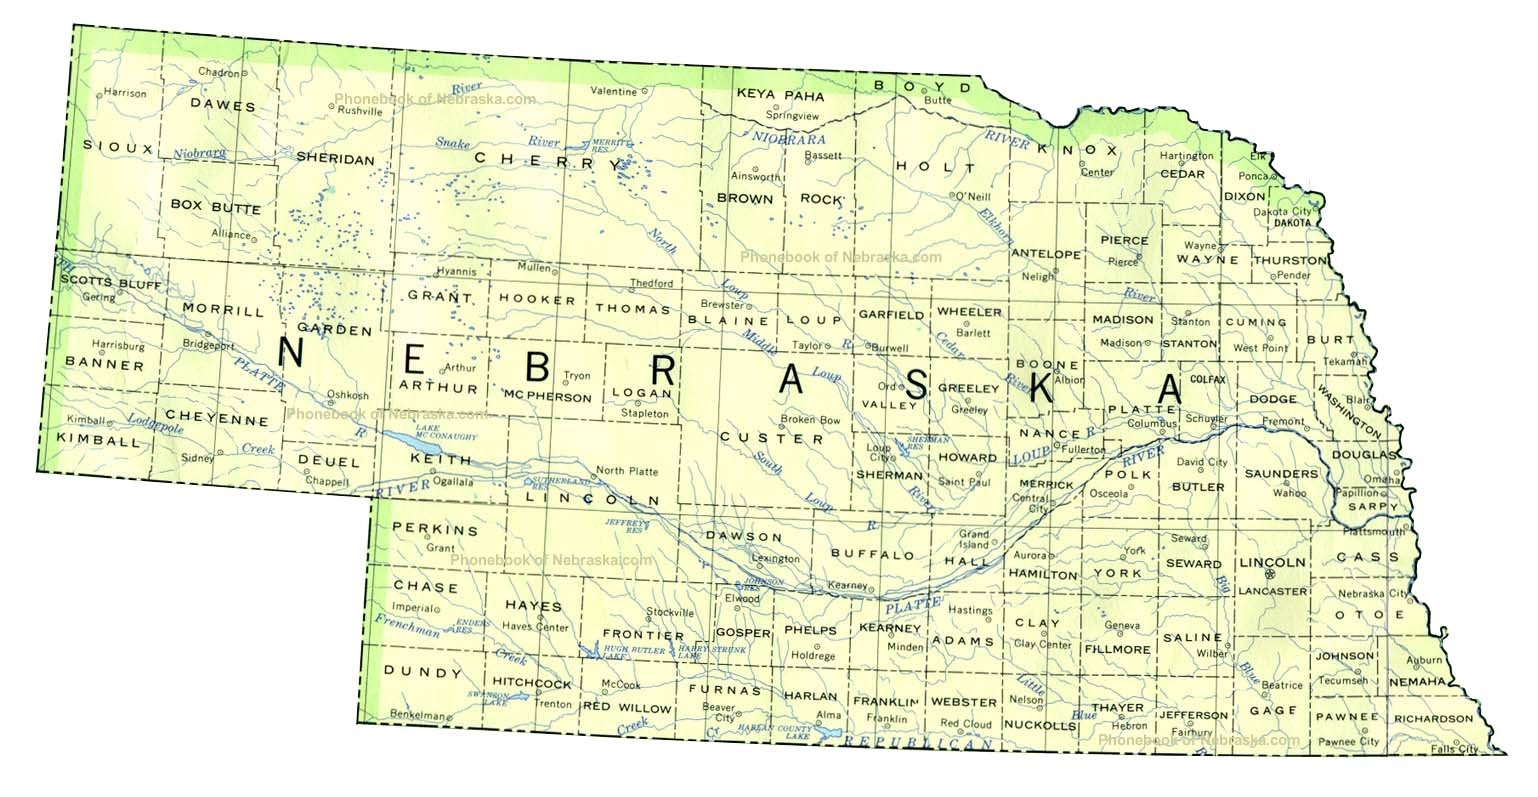 Map of Nebraska by Phonebook of Nebraska.com